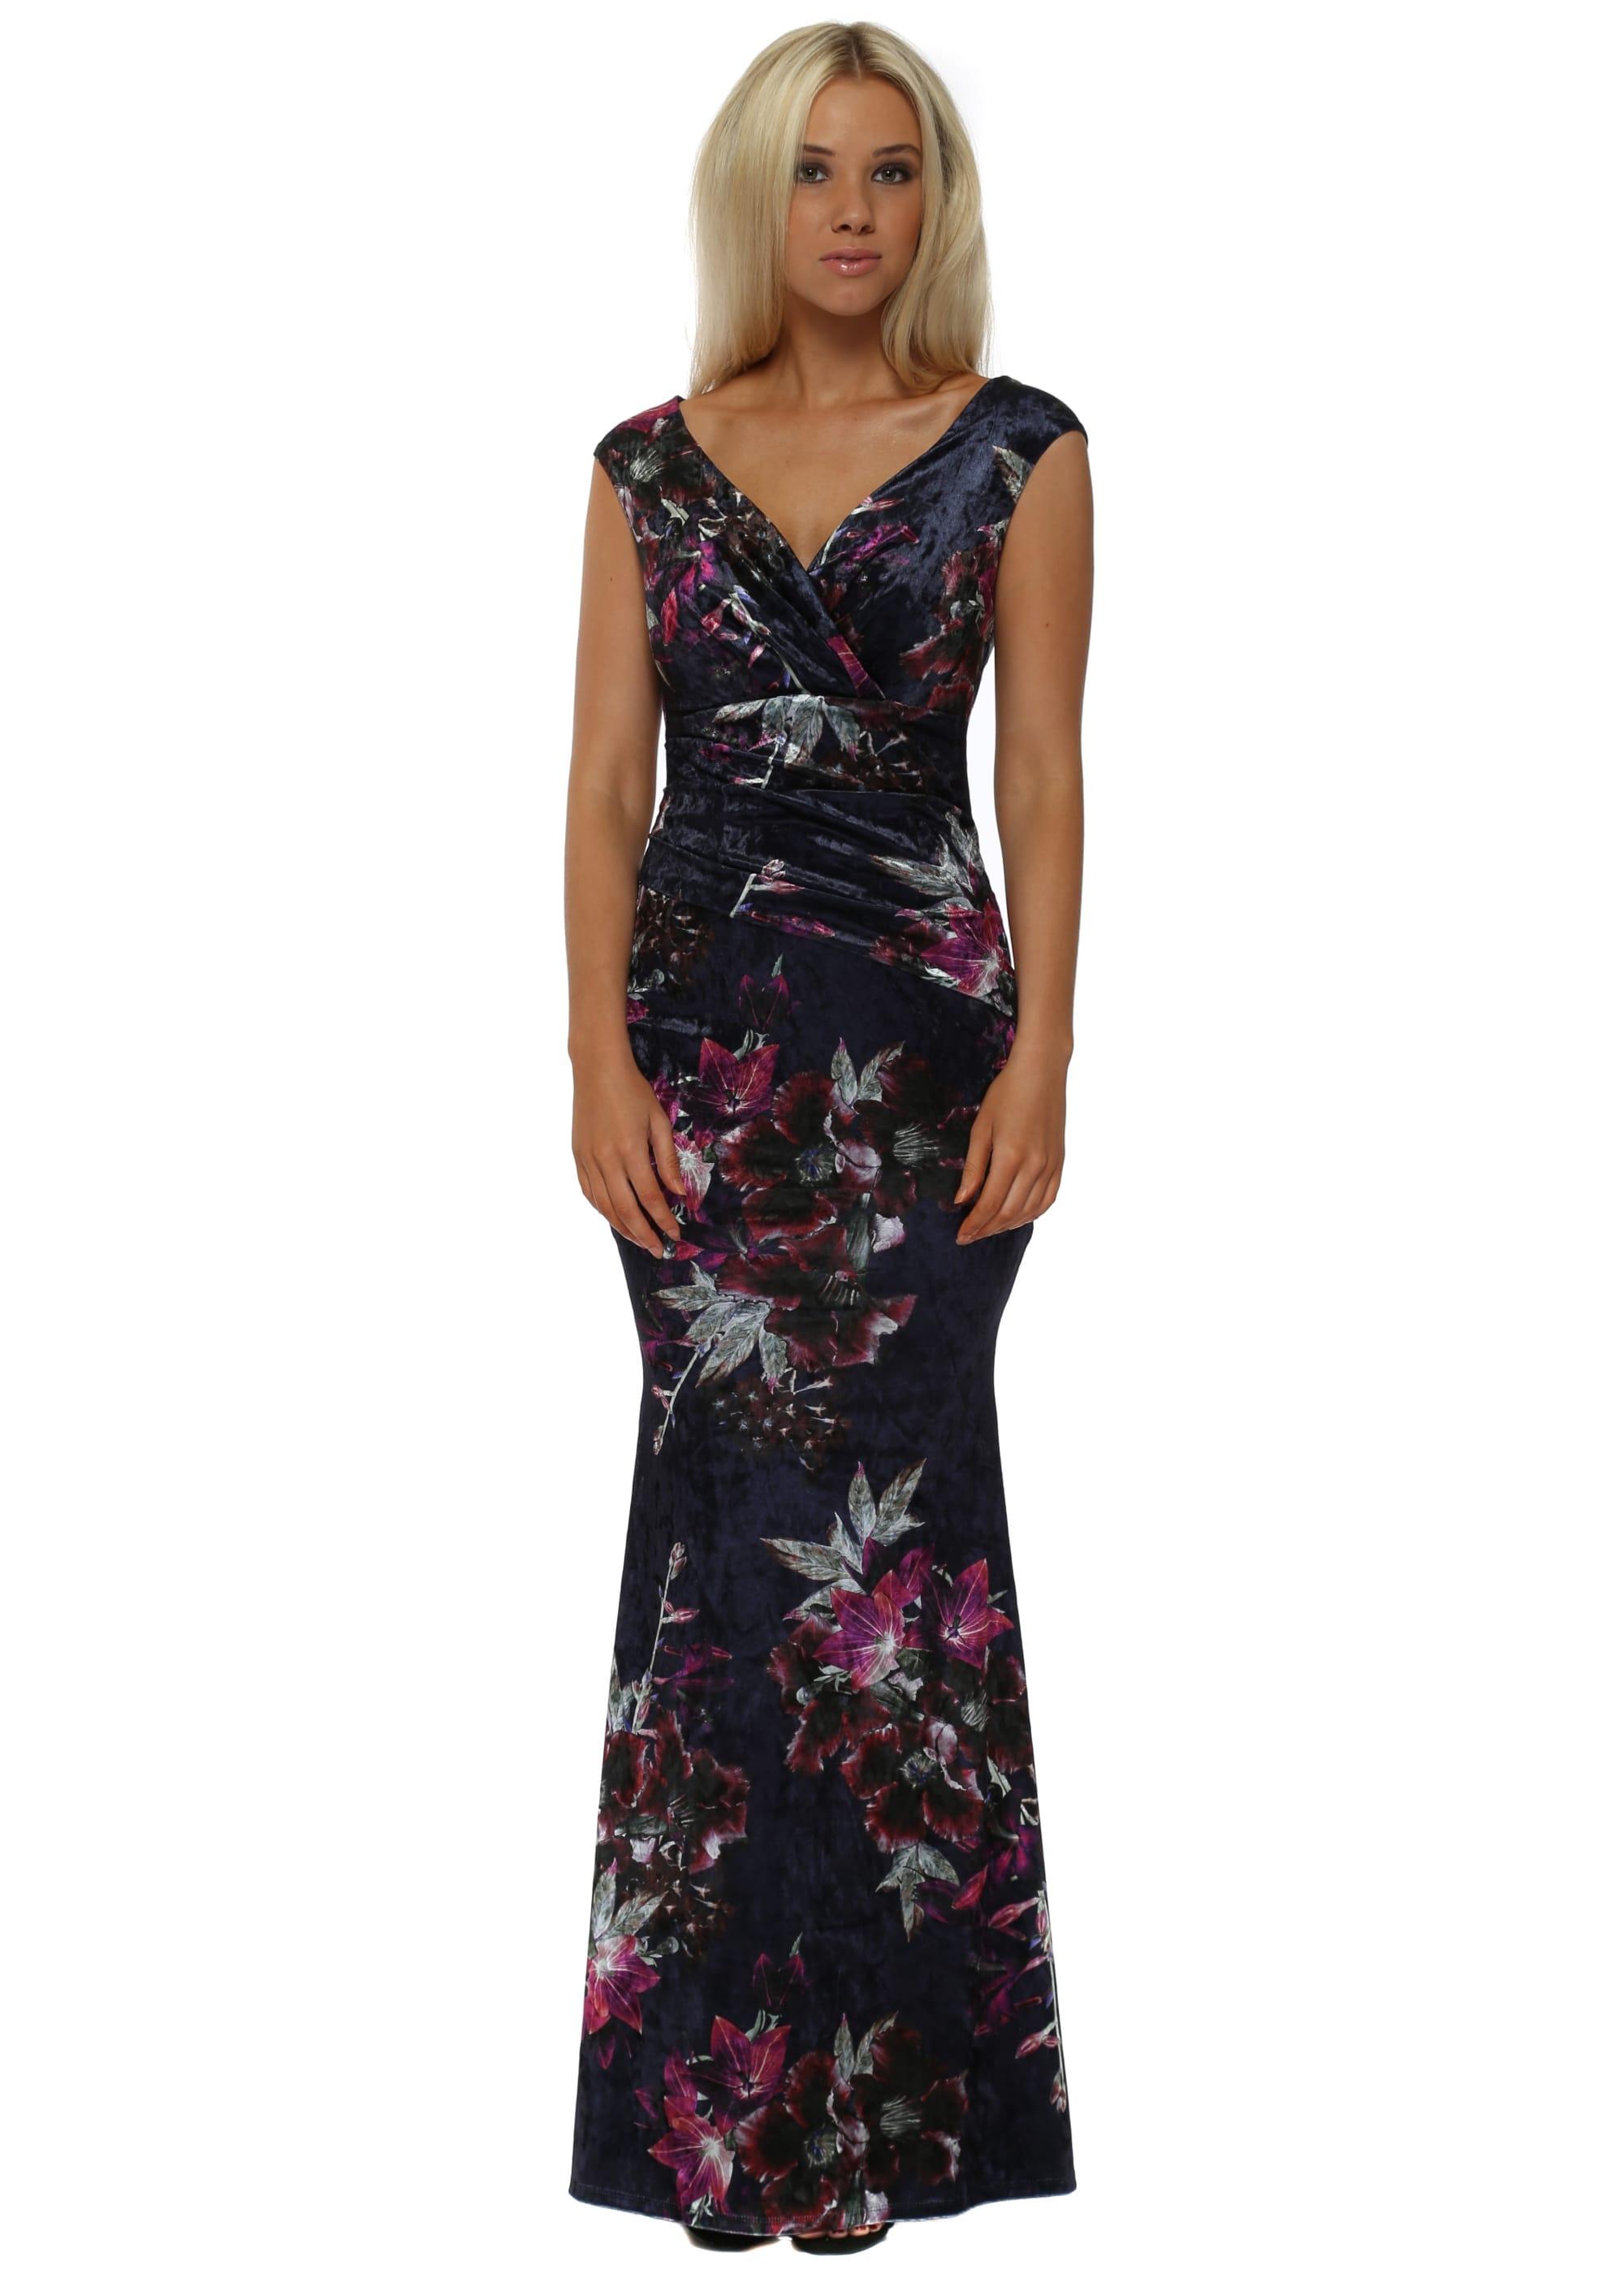 46177957b6a1 Navy Bardot Velvet Floral Maxi Dress - Goddiva By Goddess London